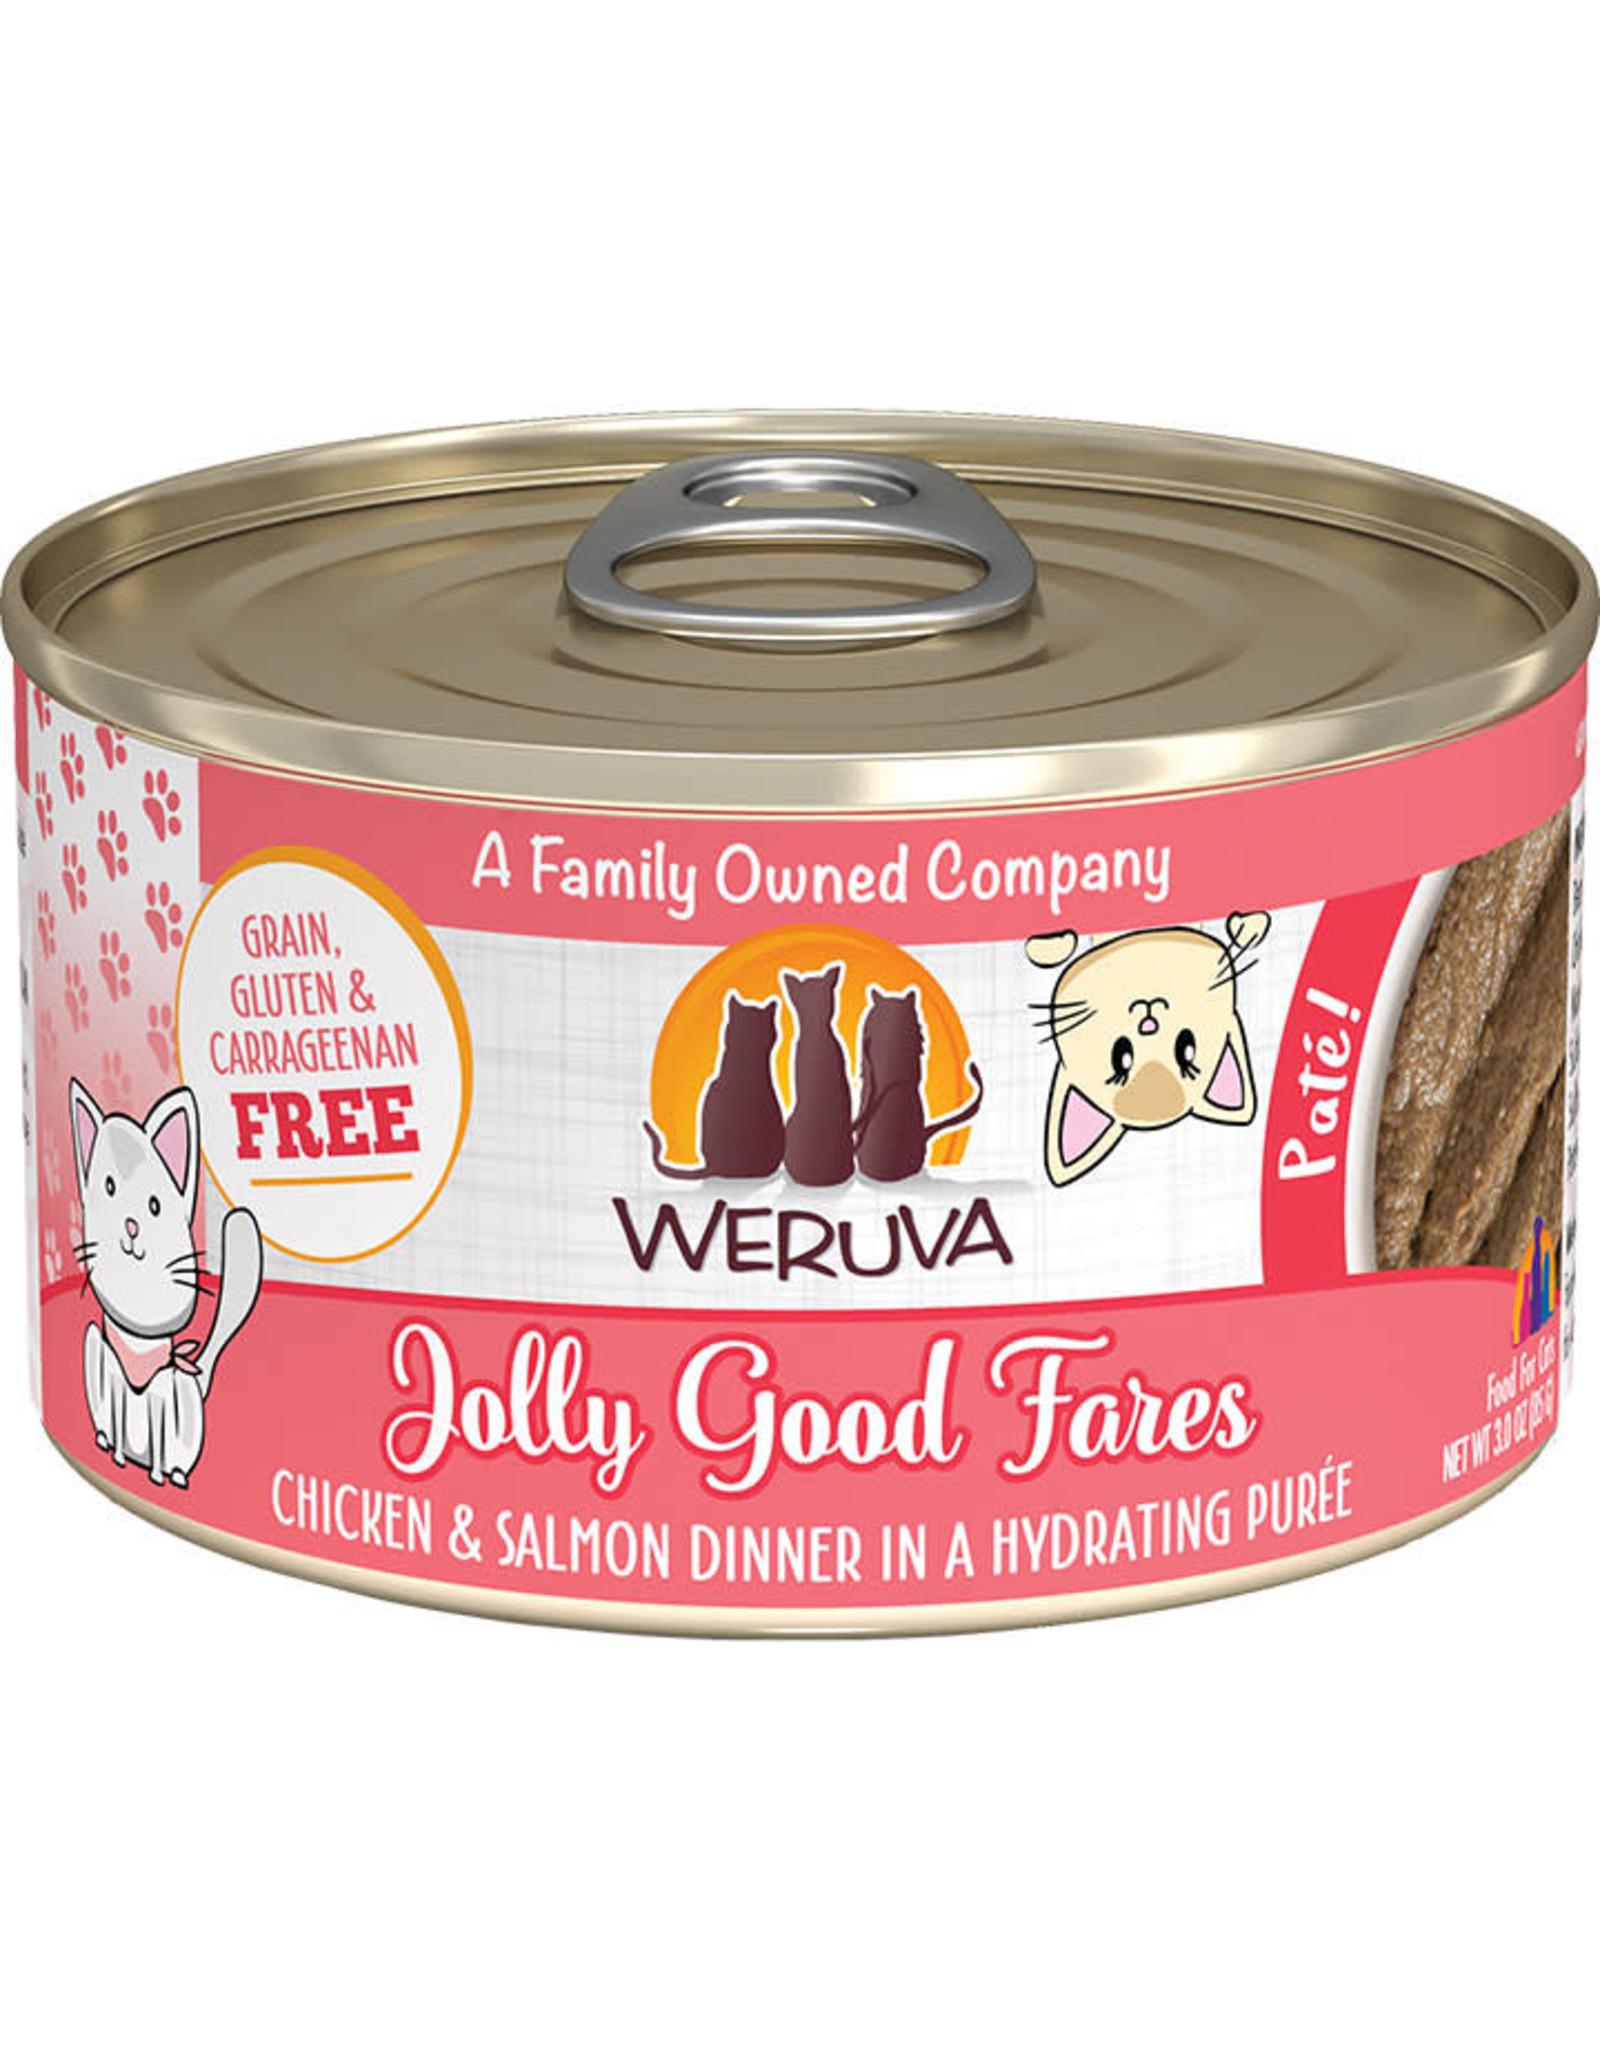 Weruva Weruva Jolly Good Fares Chicken & Salmon Dinner Pate Cat Food 3oz